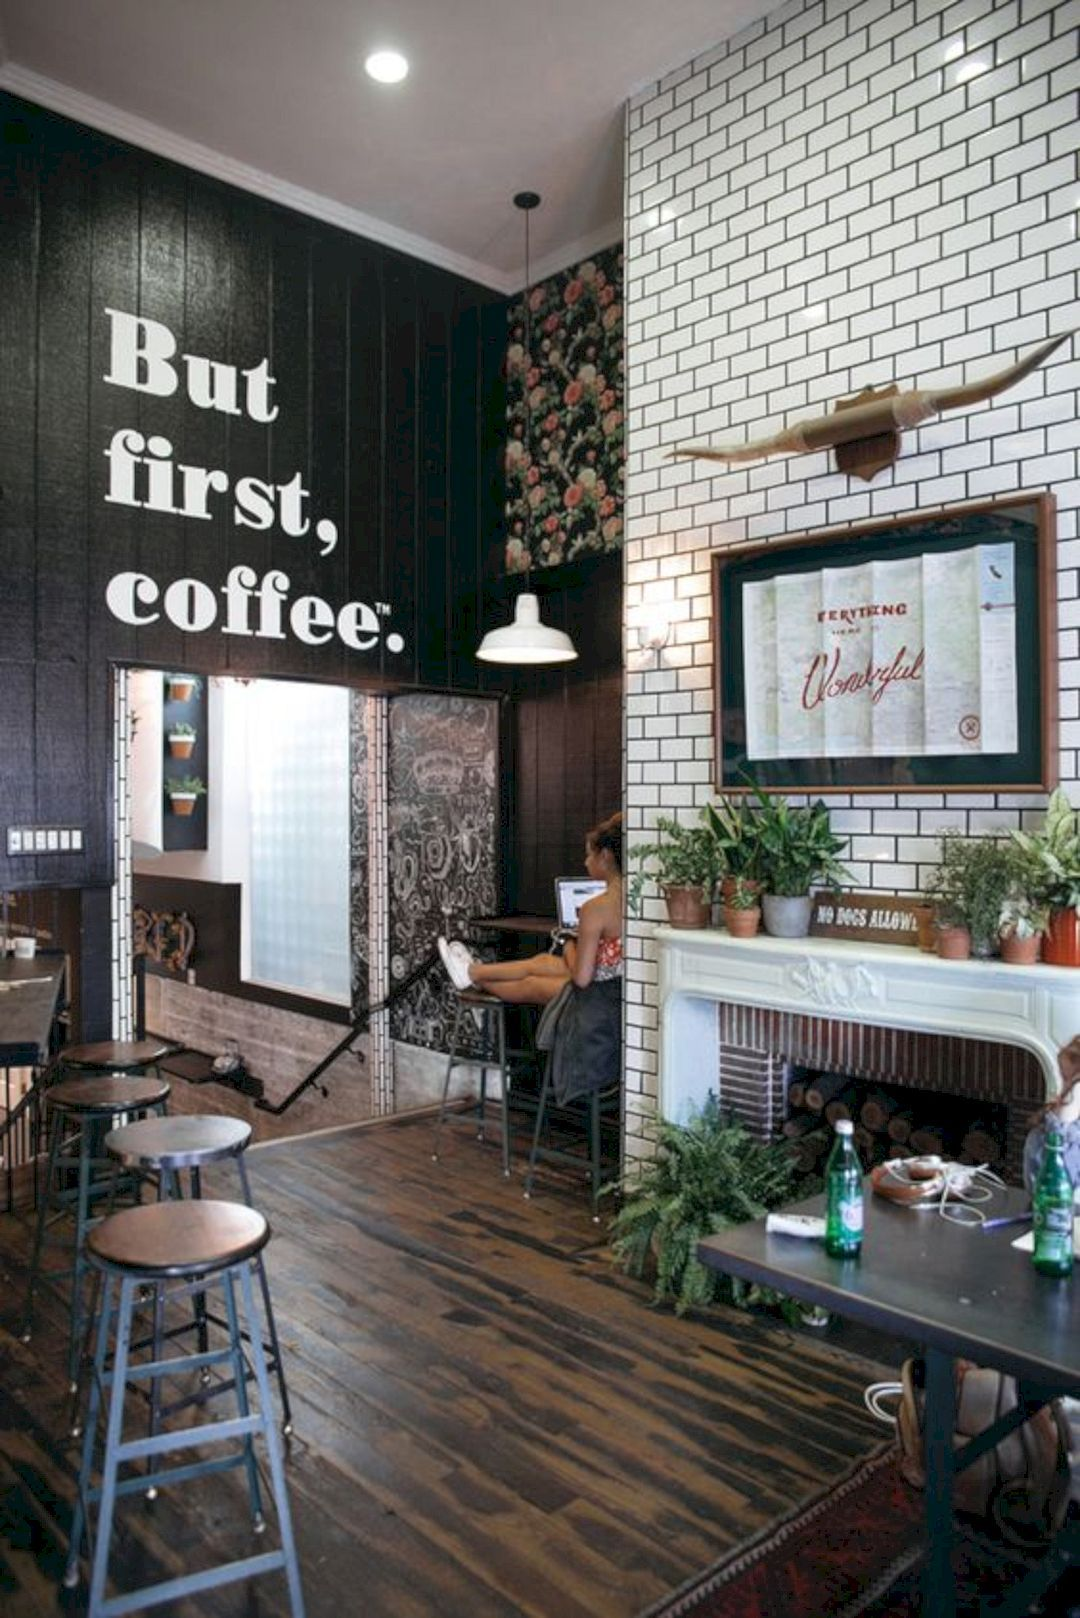 16 Small Cafe Interior Design Ideas Coffee Shop Decor Coffee